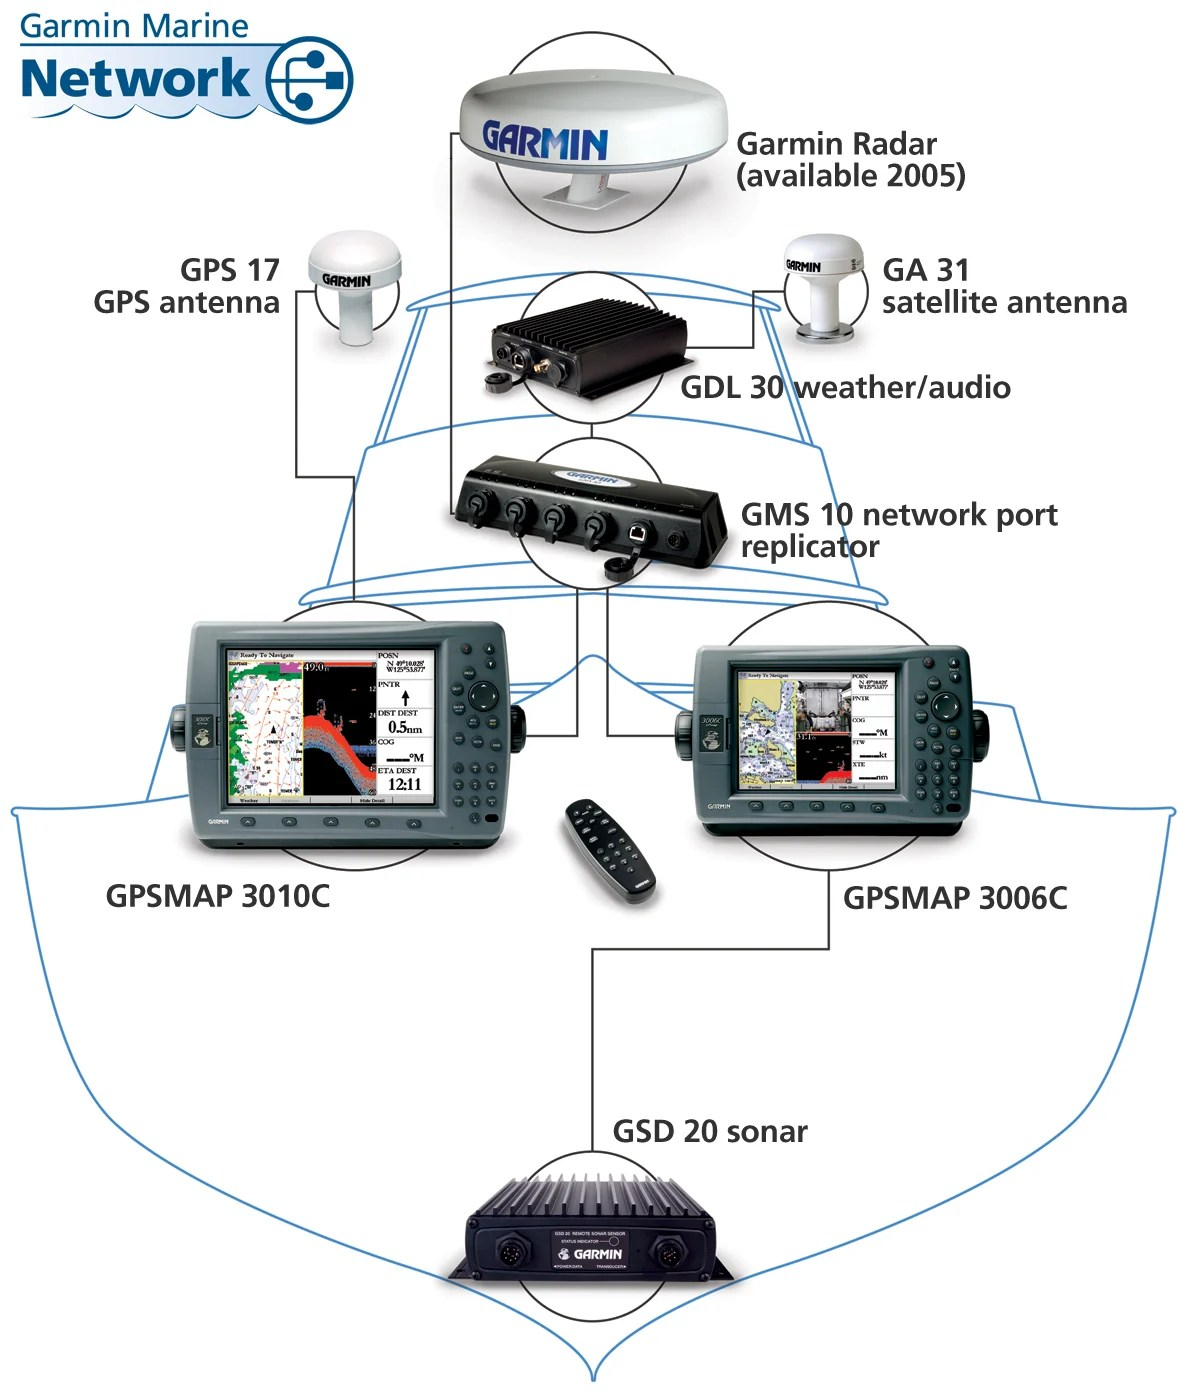 hight resolution of garmin marine wiring diagrams wiring diagram imp garmin chartplotter wiring diagram diagram data schema garmin marine